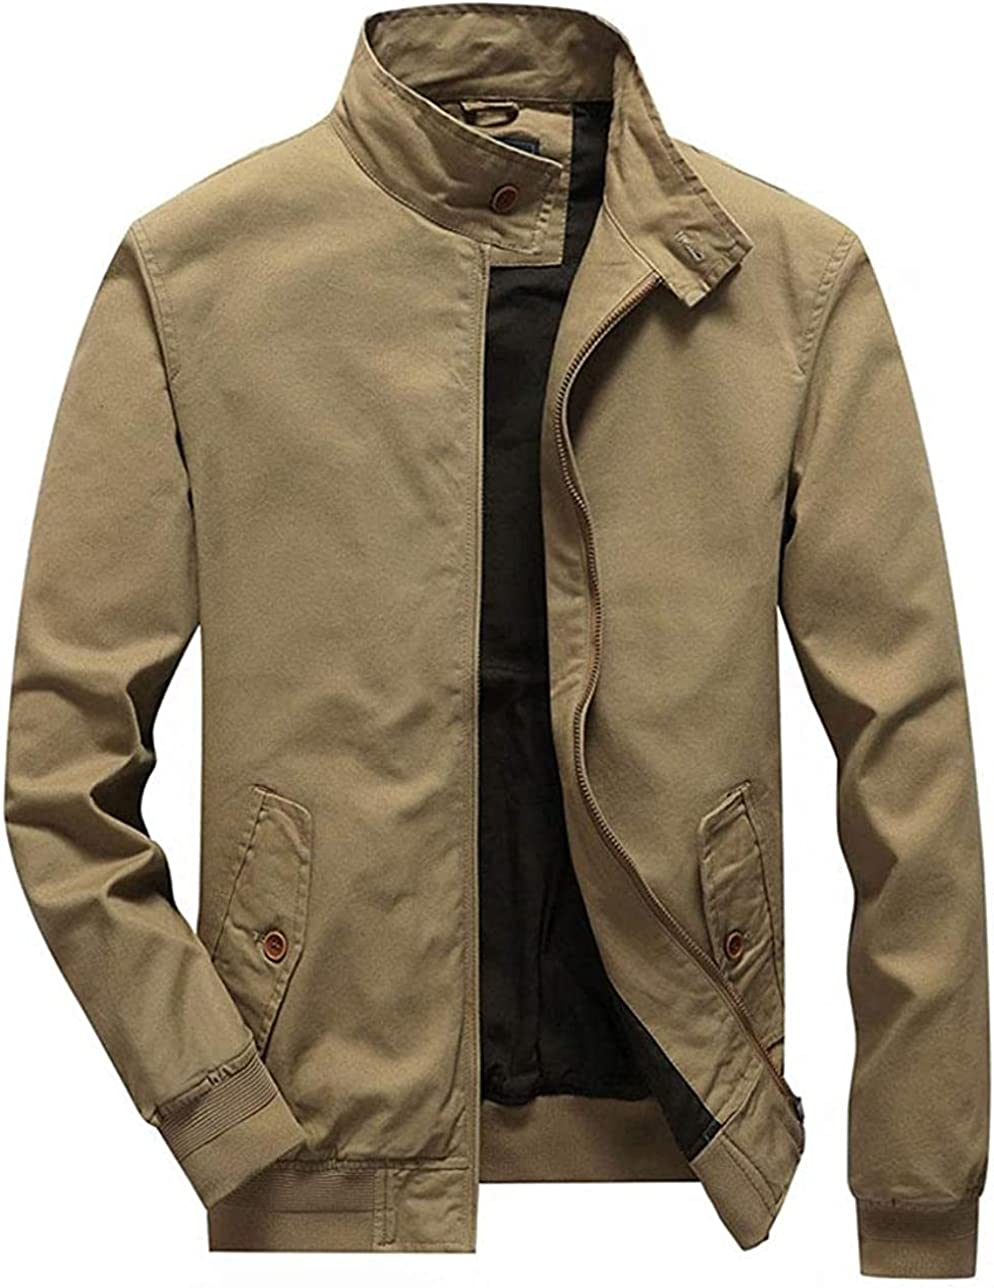 Men's Zip Up Buttoned Collar Cotton Twill Outdoor Workwear Jacket